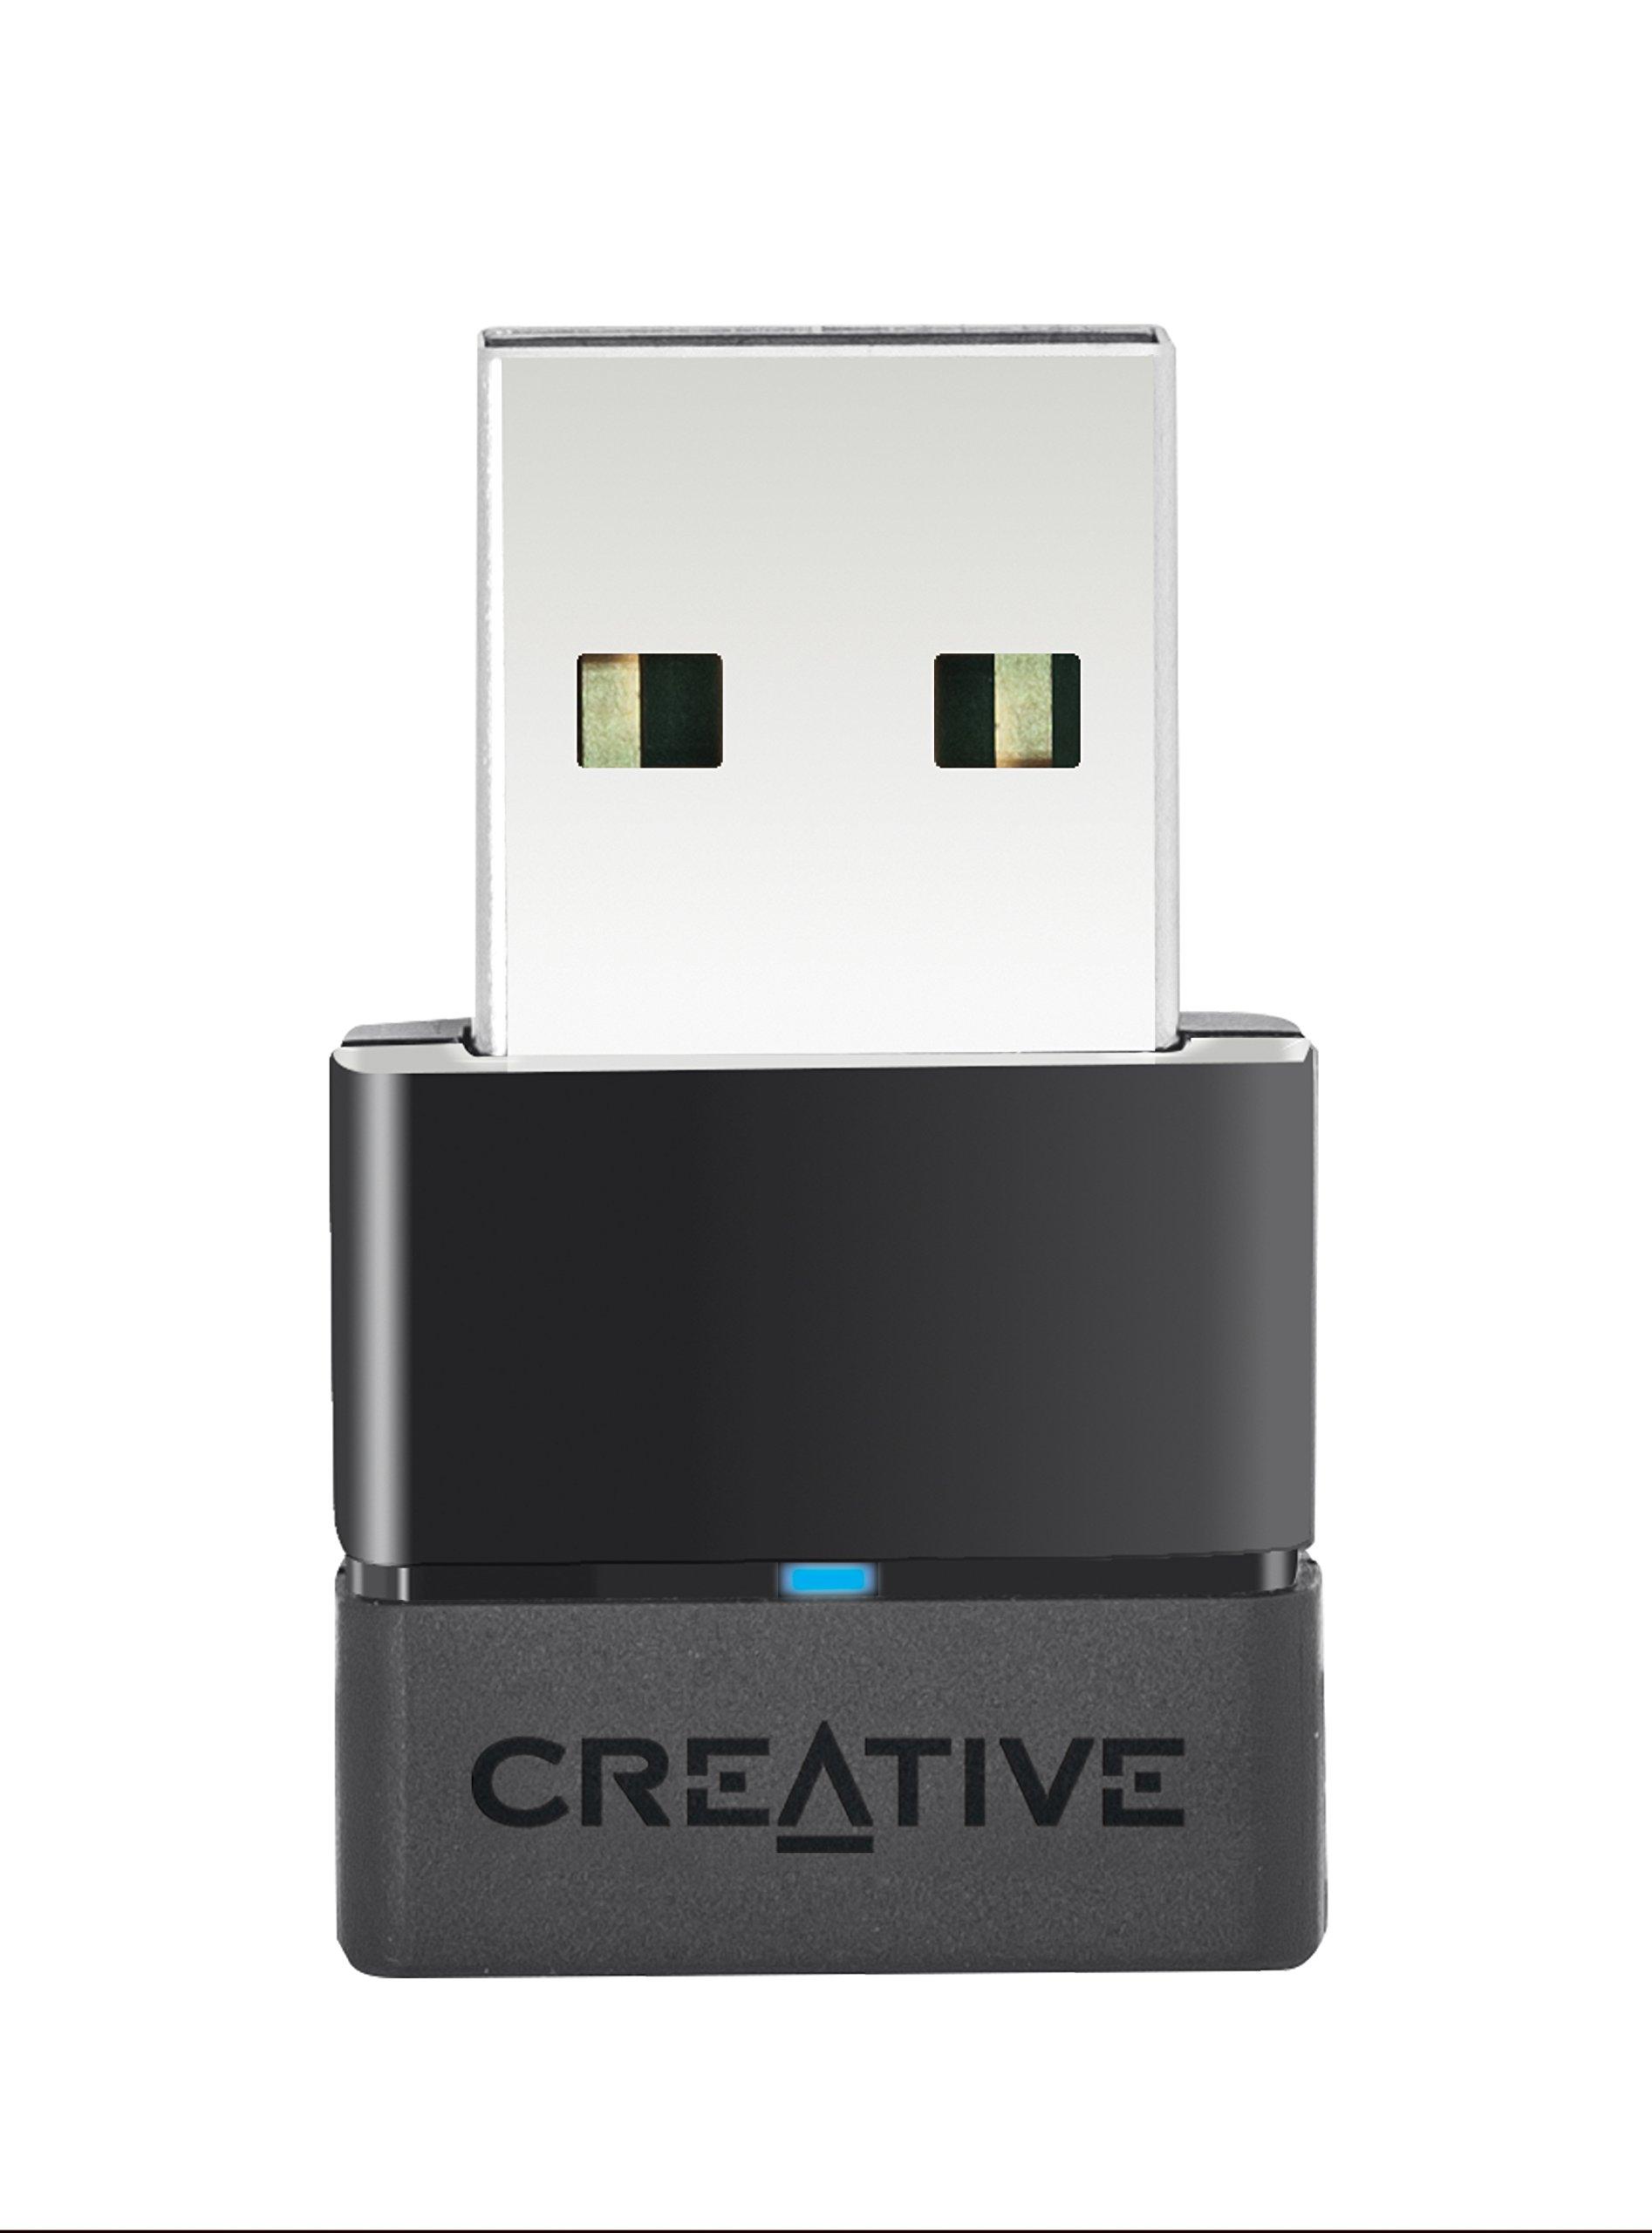 BLUETOOTH AUDIO BT-W2 USB BT TRANSCEIVER by Creative Labs (Image #2)